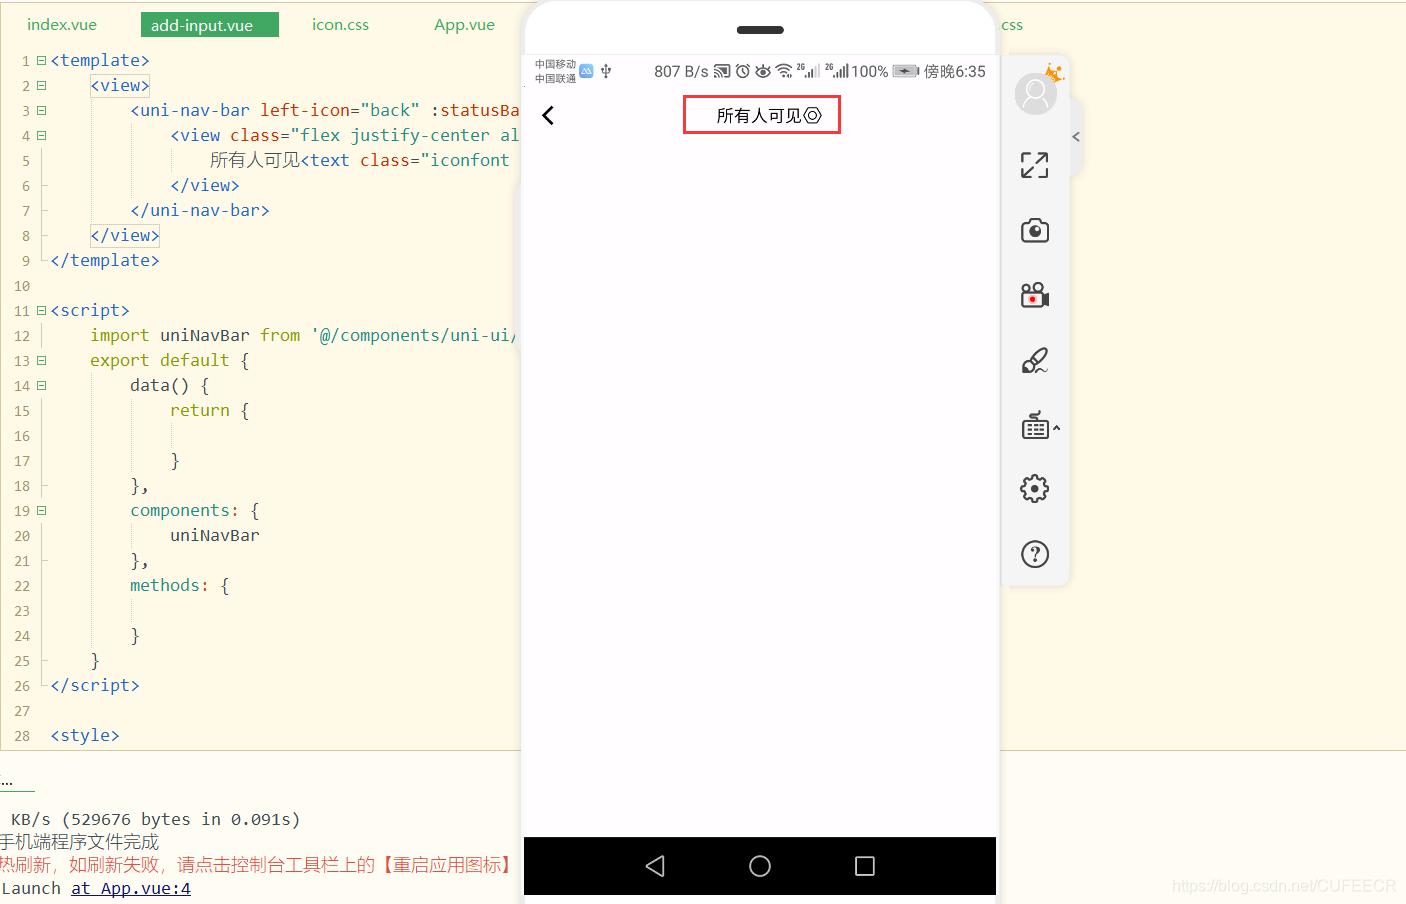 uniapp social app post develop self navigation complete